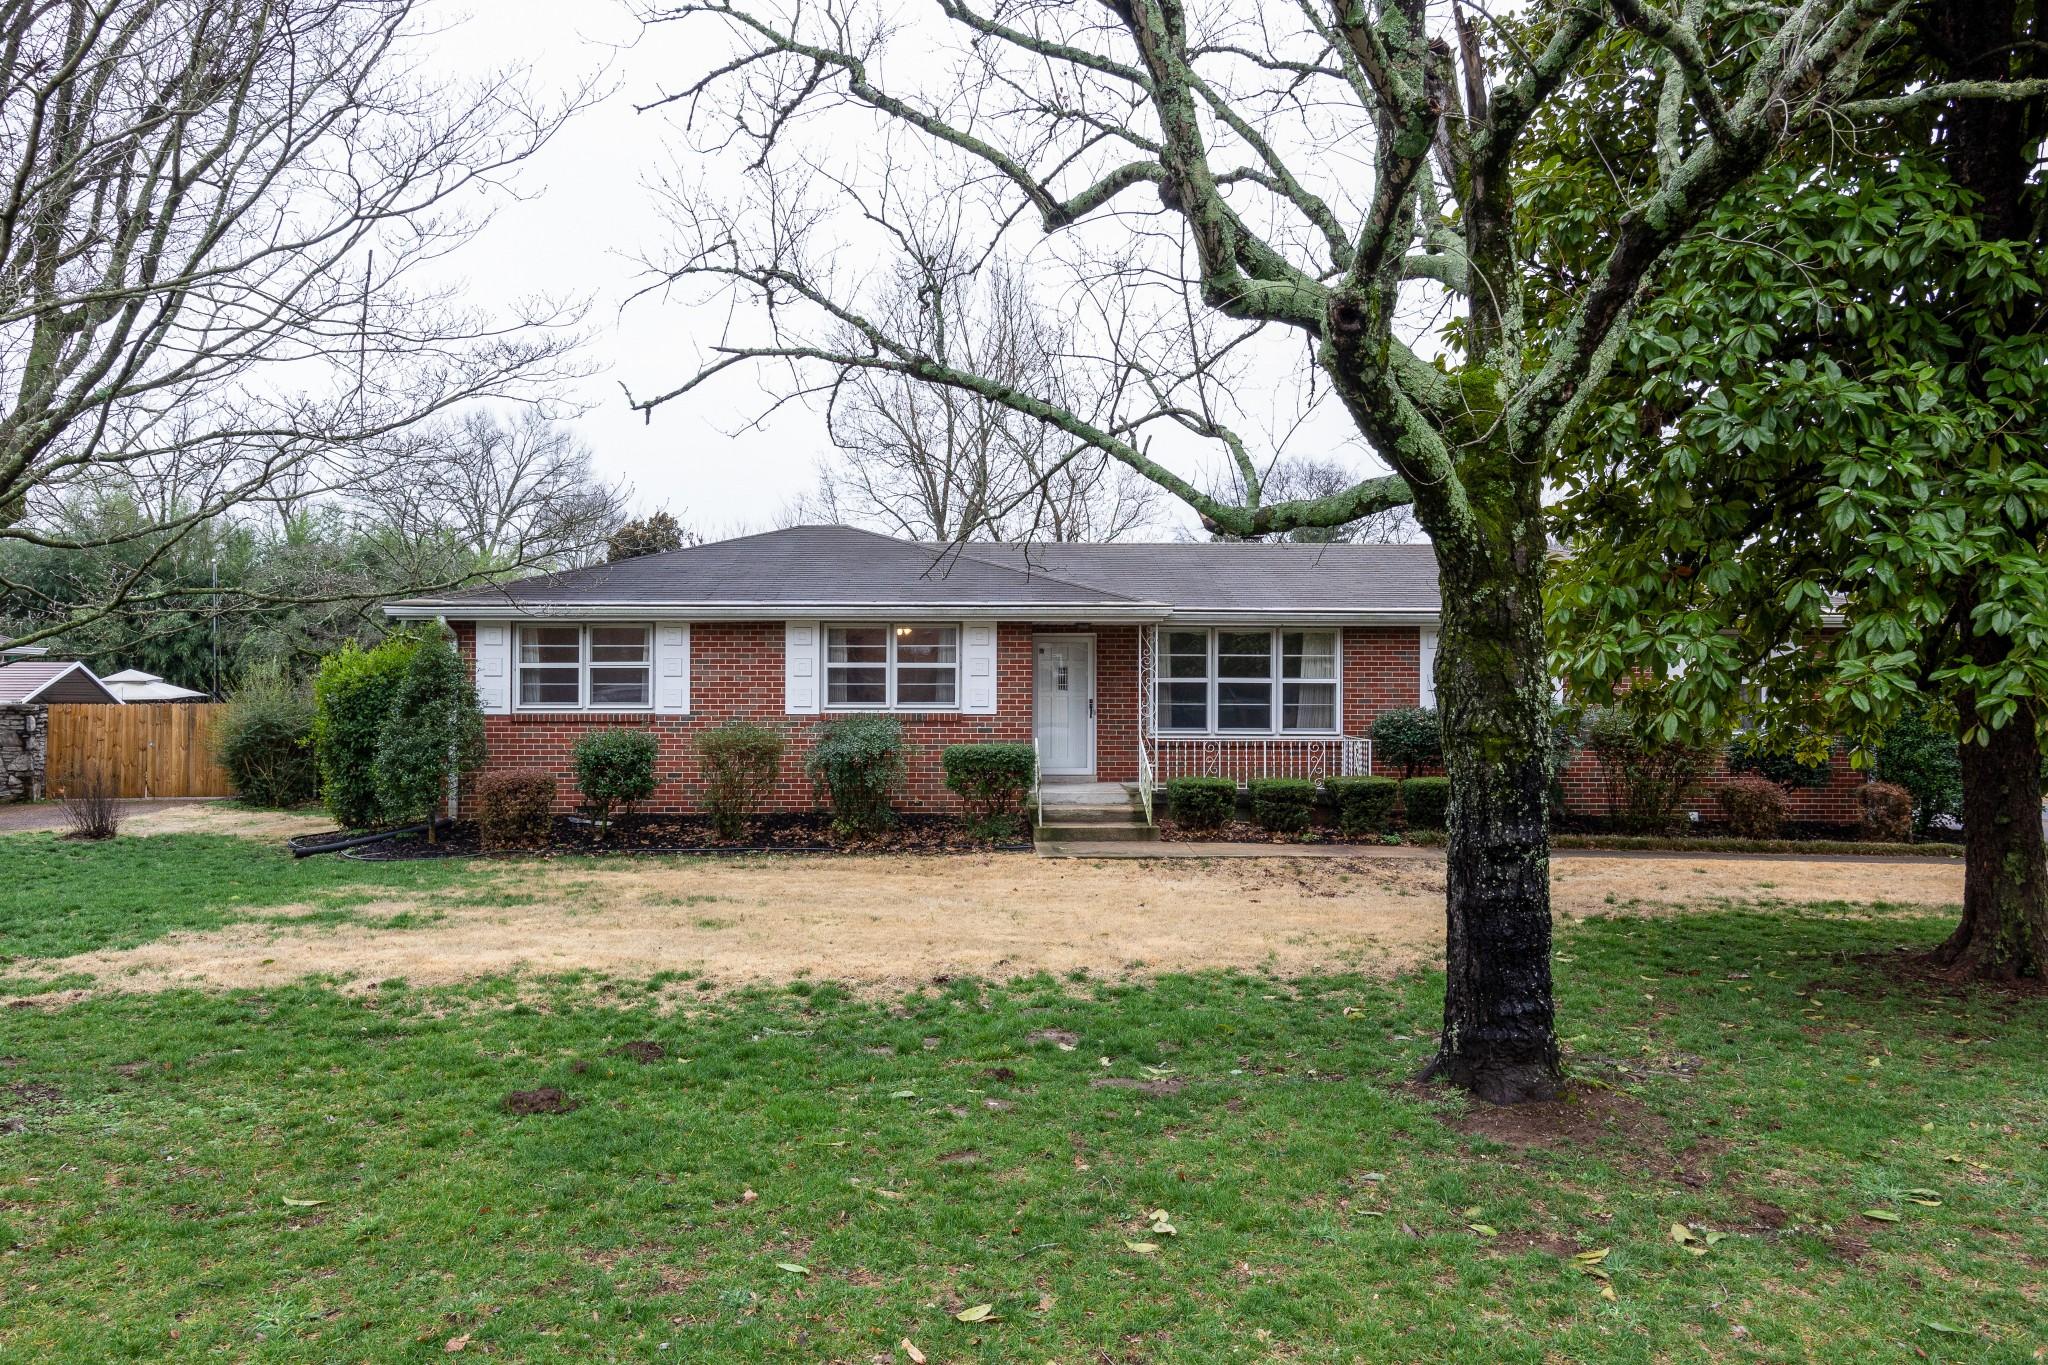 2933 Fernbrook Ln, Nashville, TN 37214 - Nashville, TN real estate listing